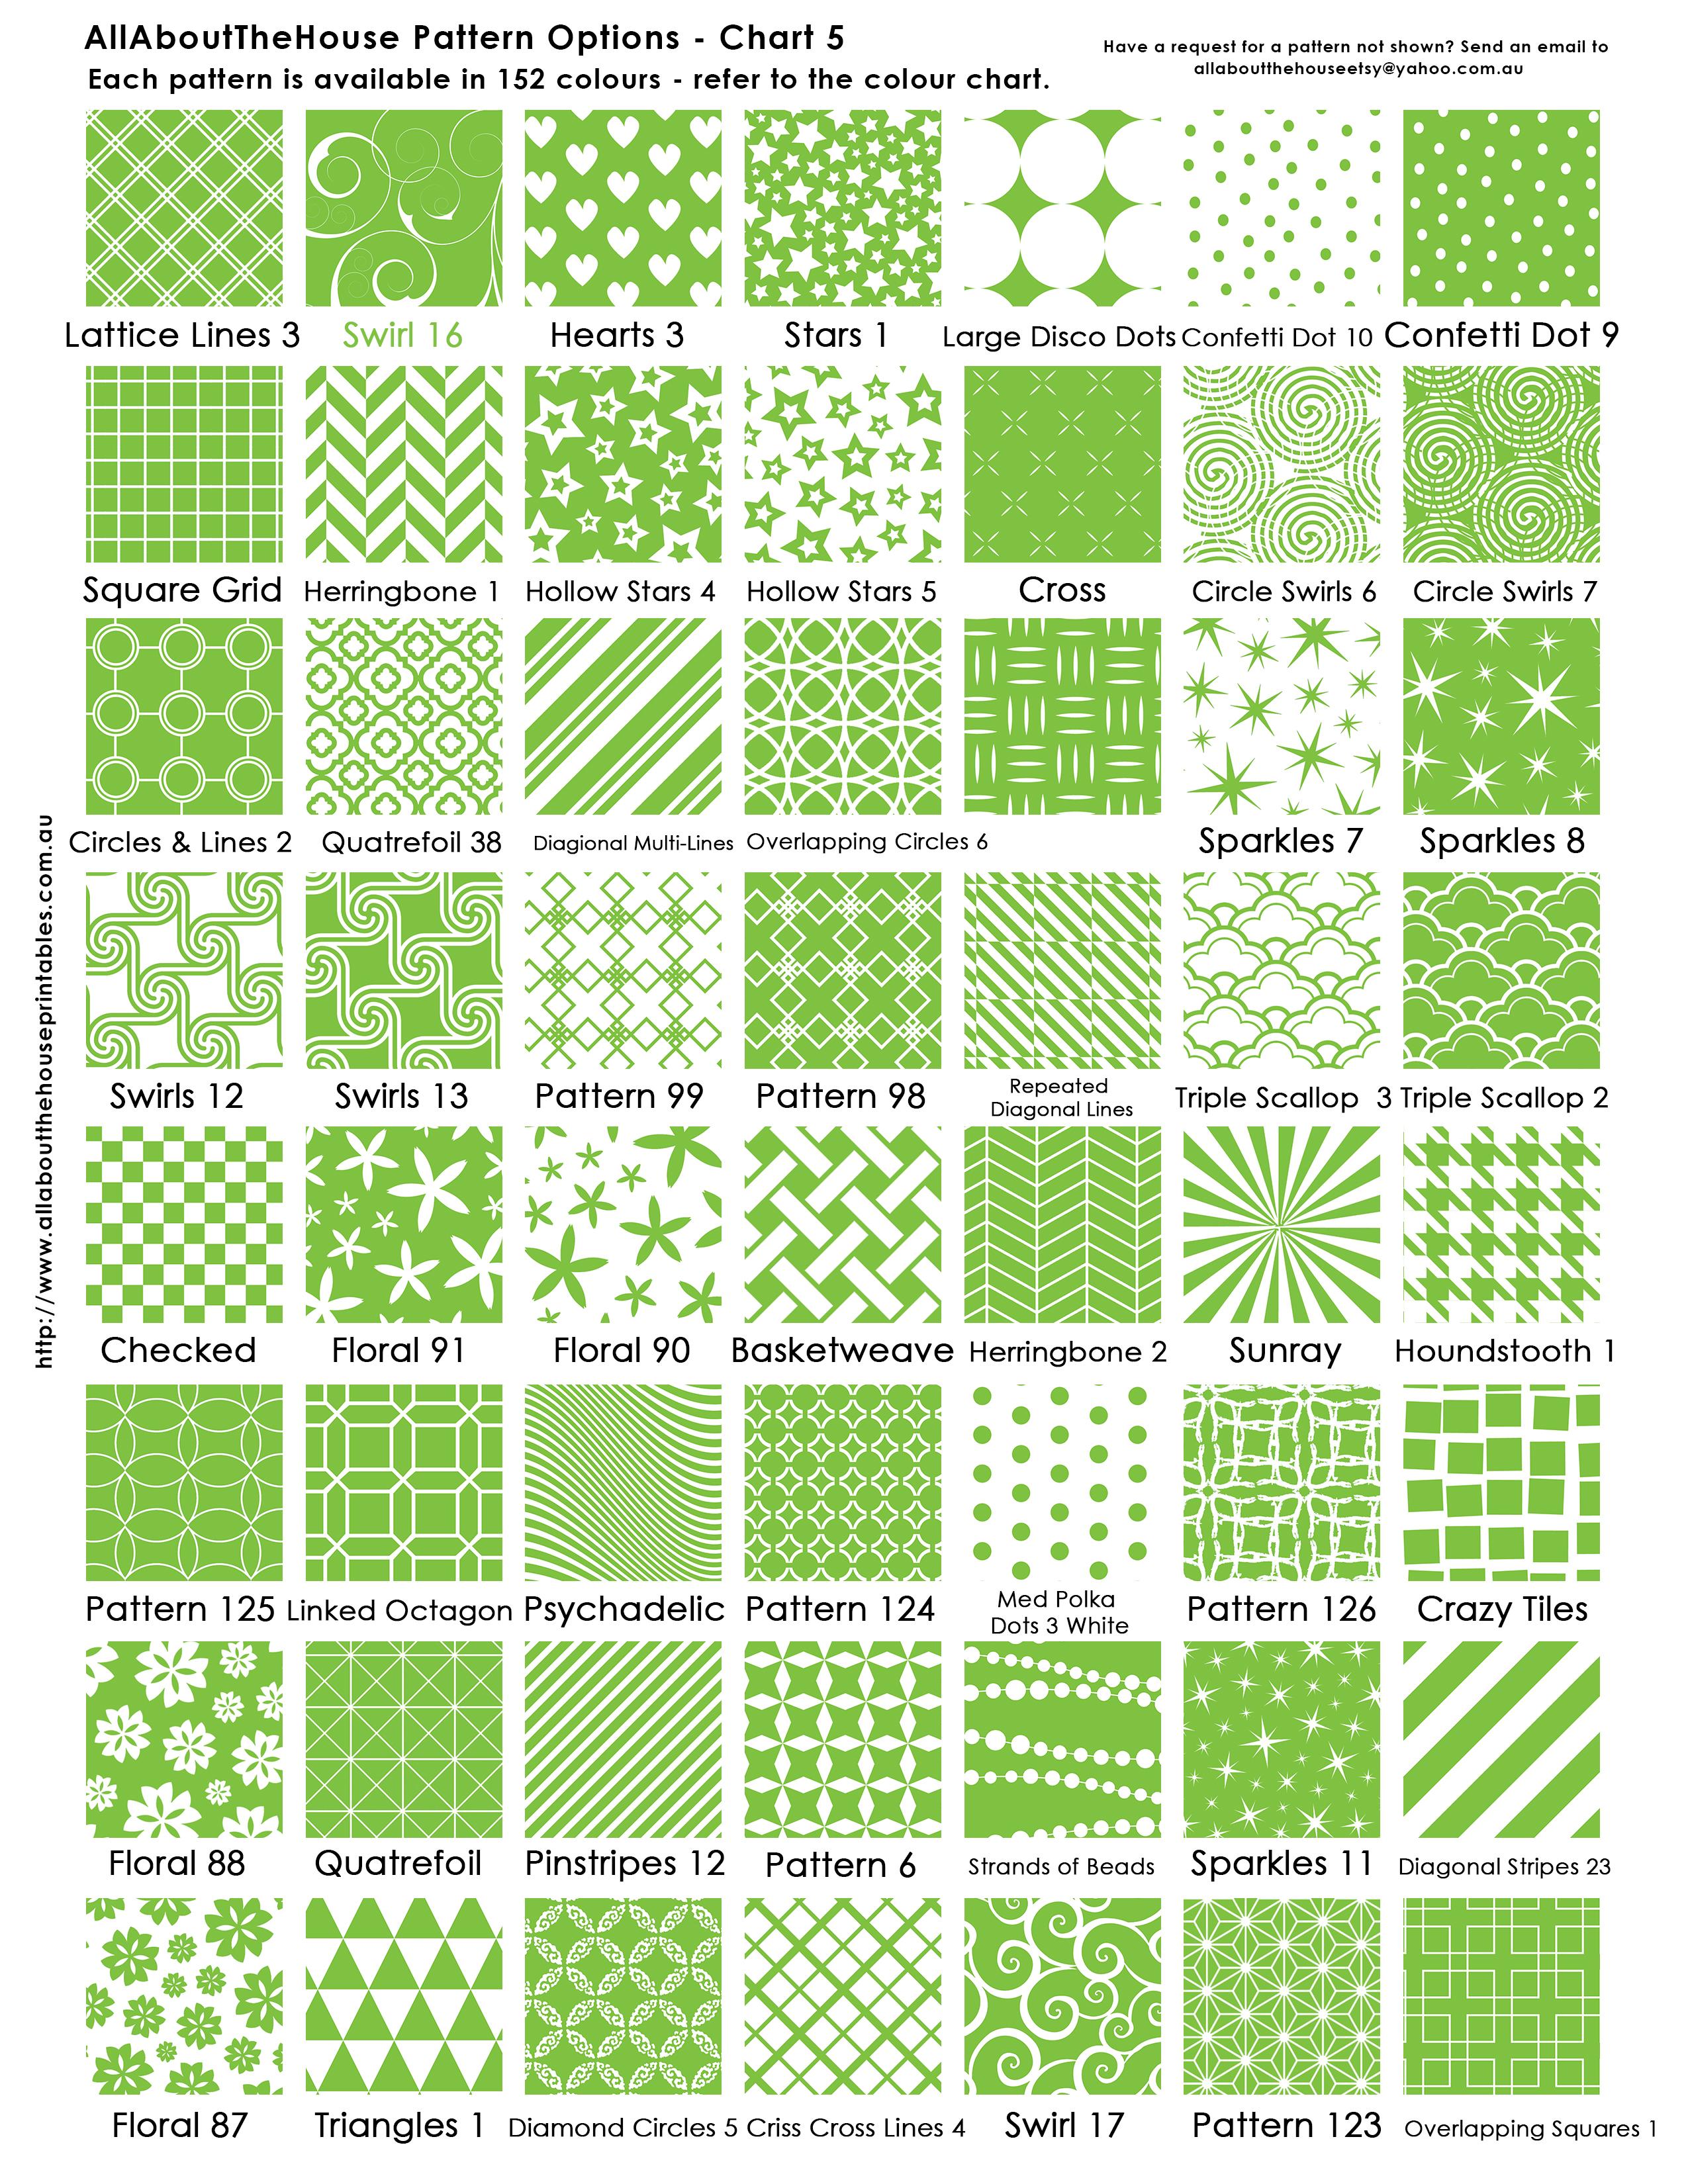 pattern-chart-5-allaboutthehouse.jpg